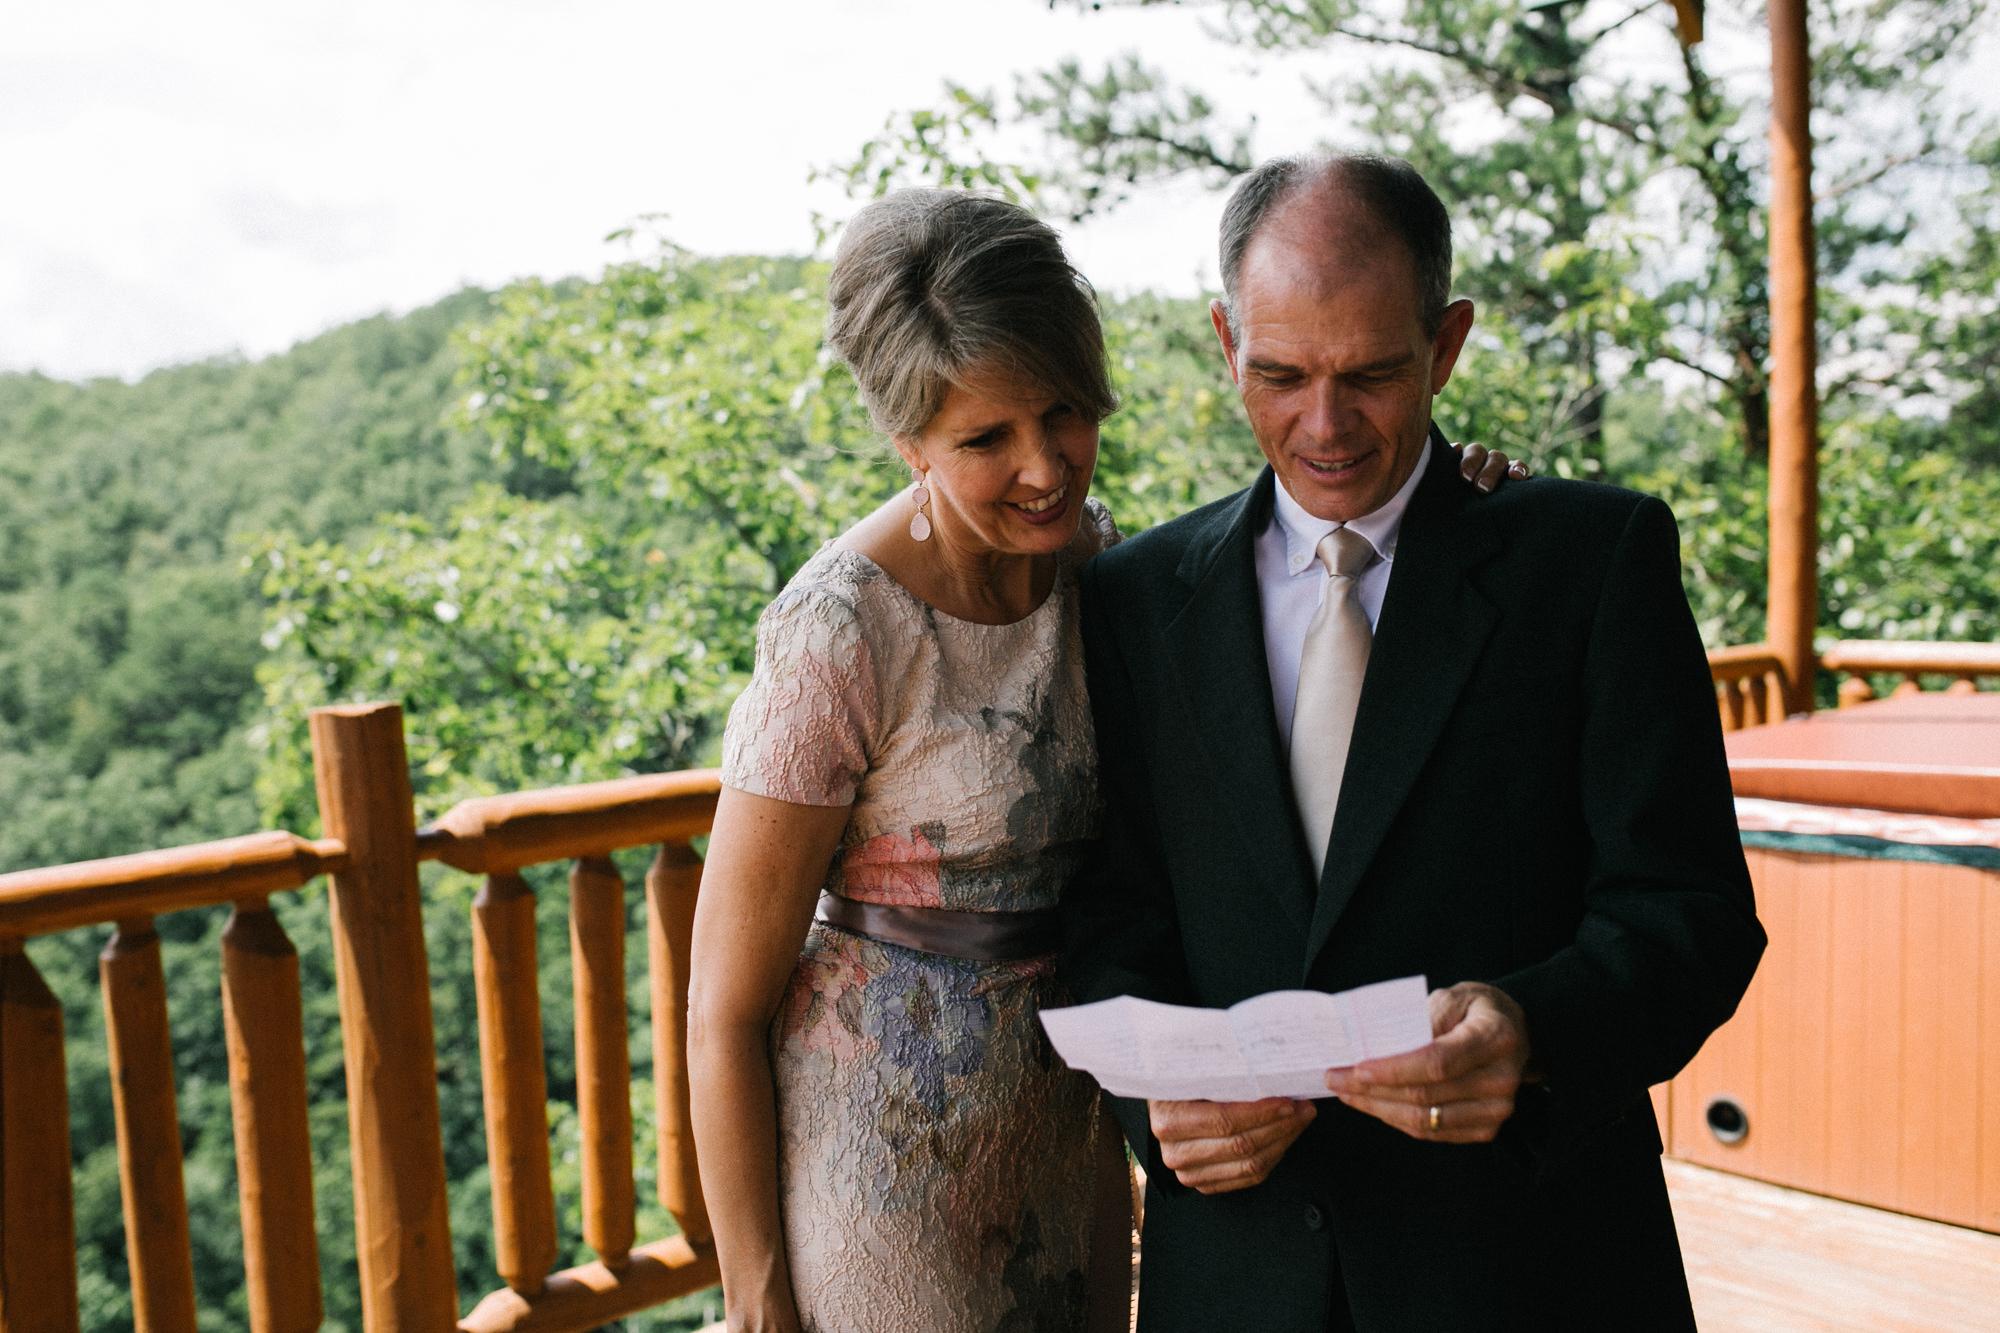 nashville_tennessee_wedding_photographer-47.jpg